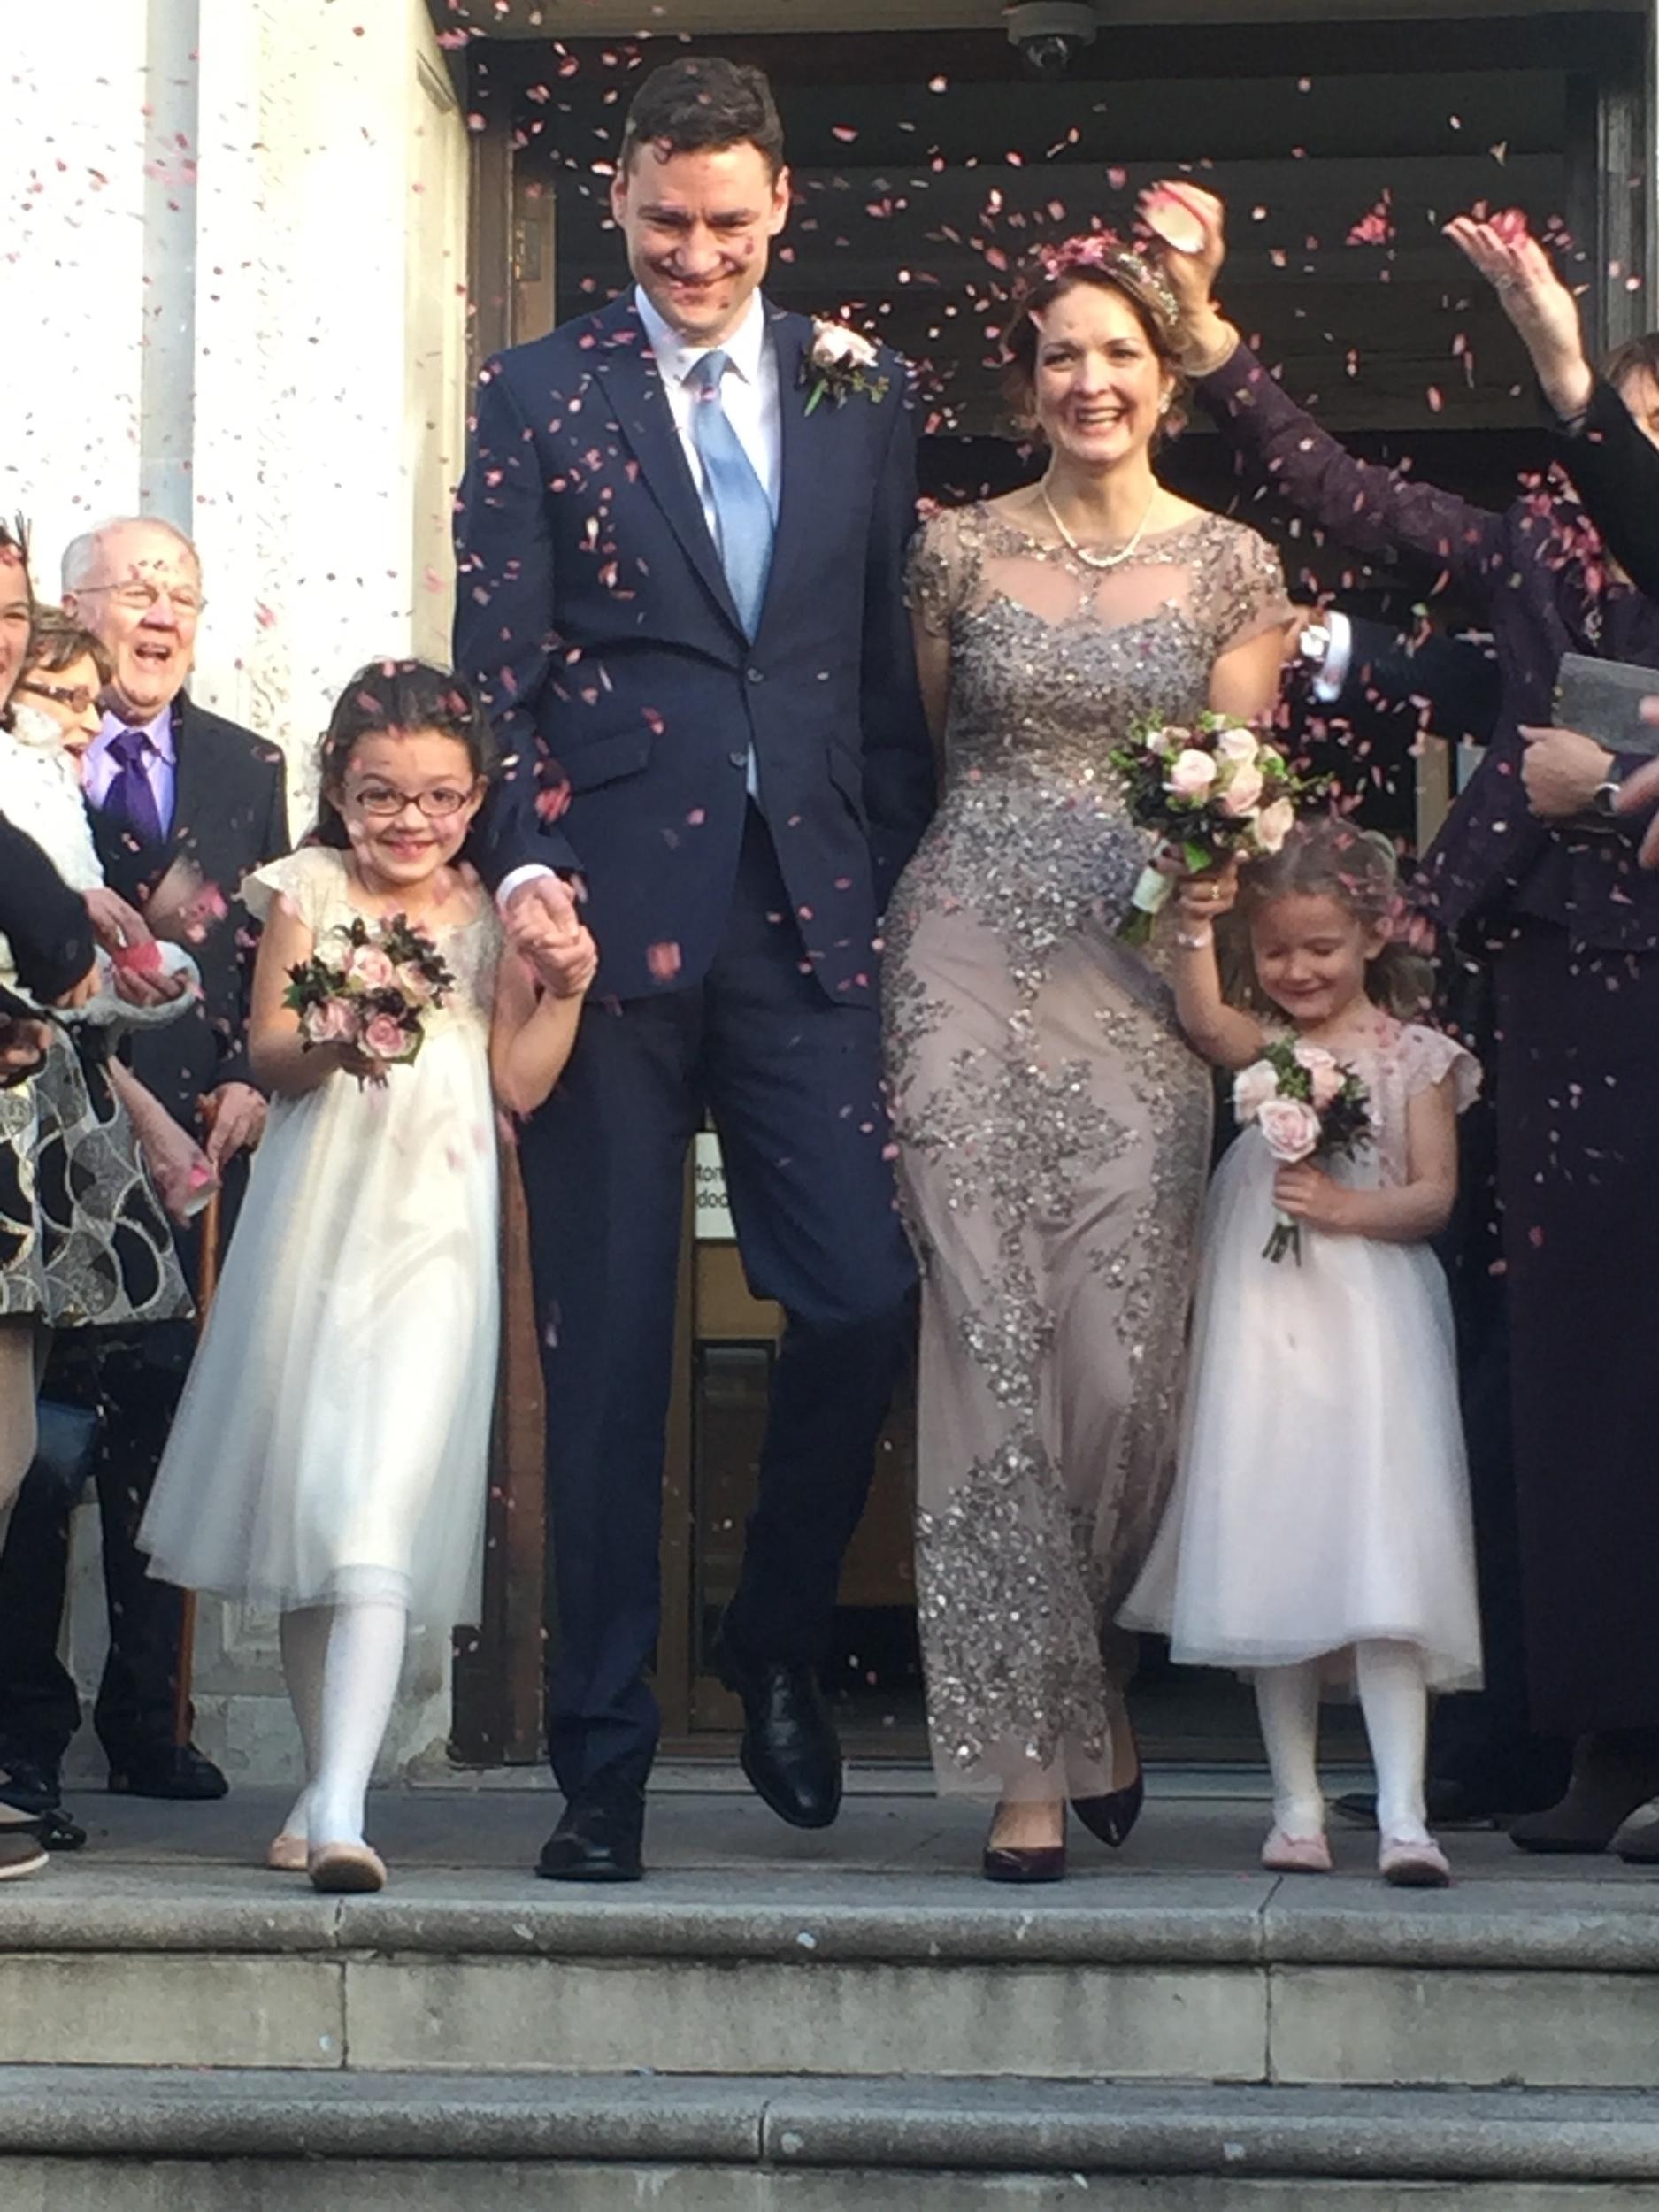 wedding-navy-wool-suit-all-uk-made-bespoke-single-breasted.jpg